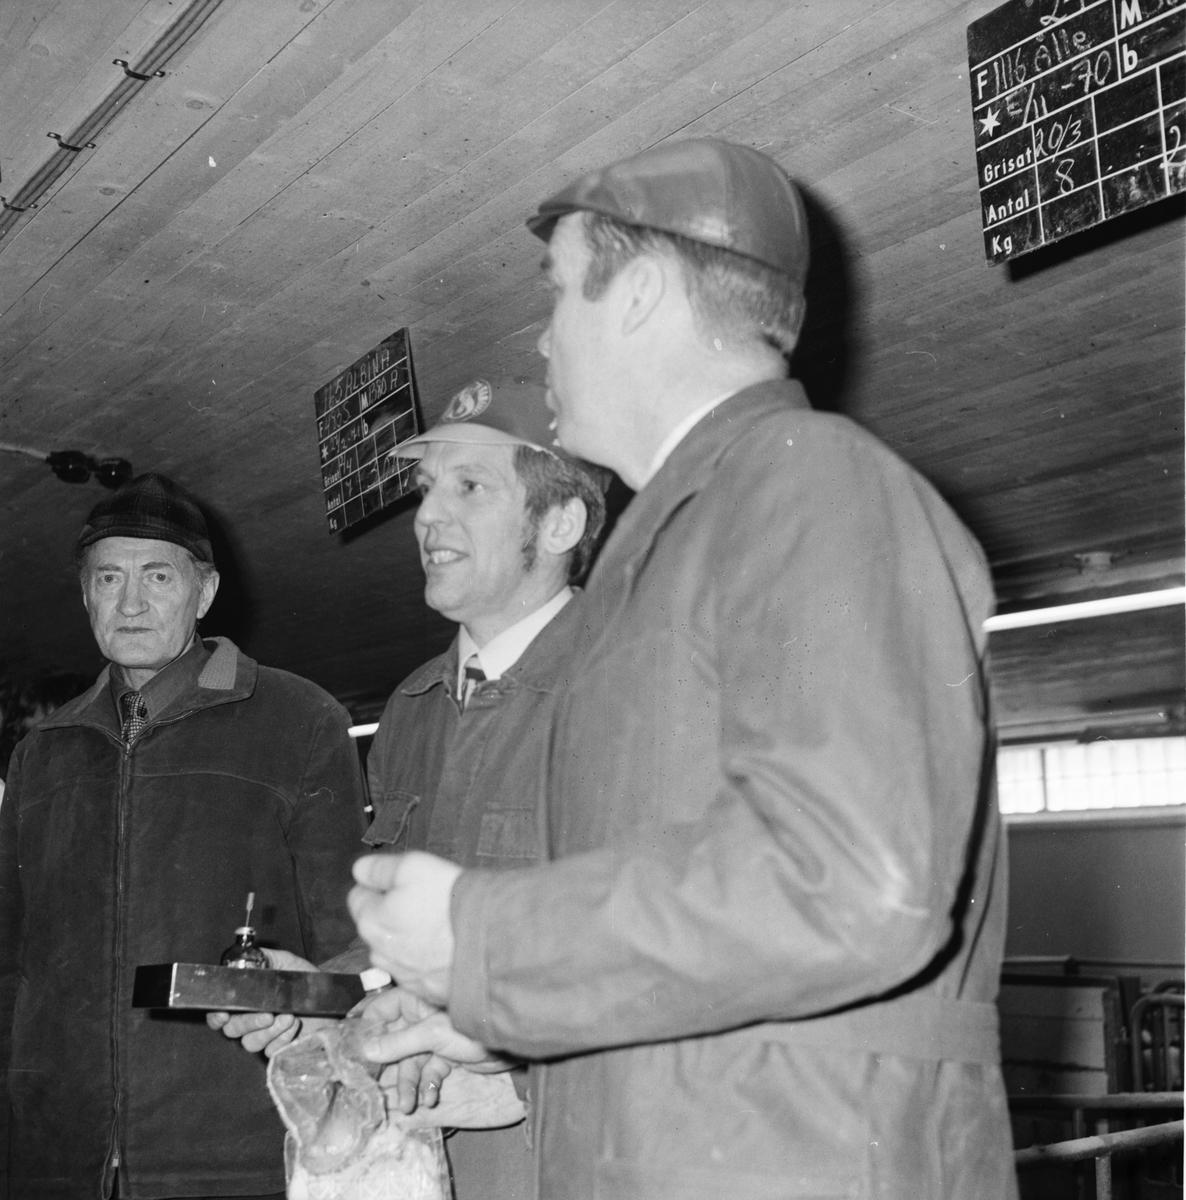 Nytorp, Svinhälsodag, April 1972